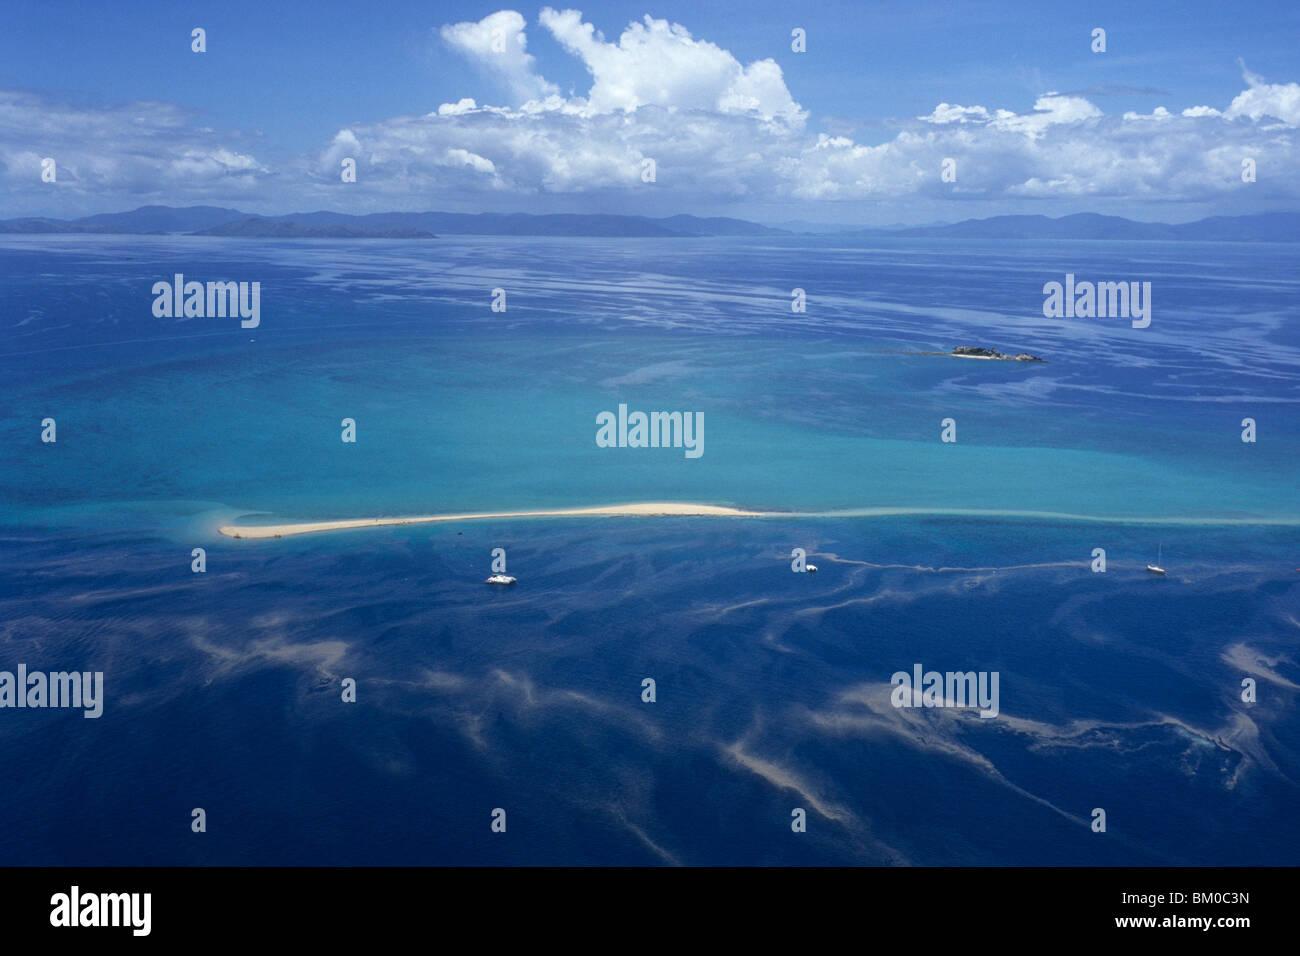 Where Is Bali Hai Island aerial photo of bali hai sandbar, near hayman island